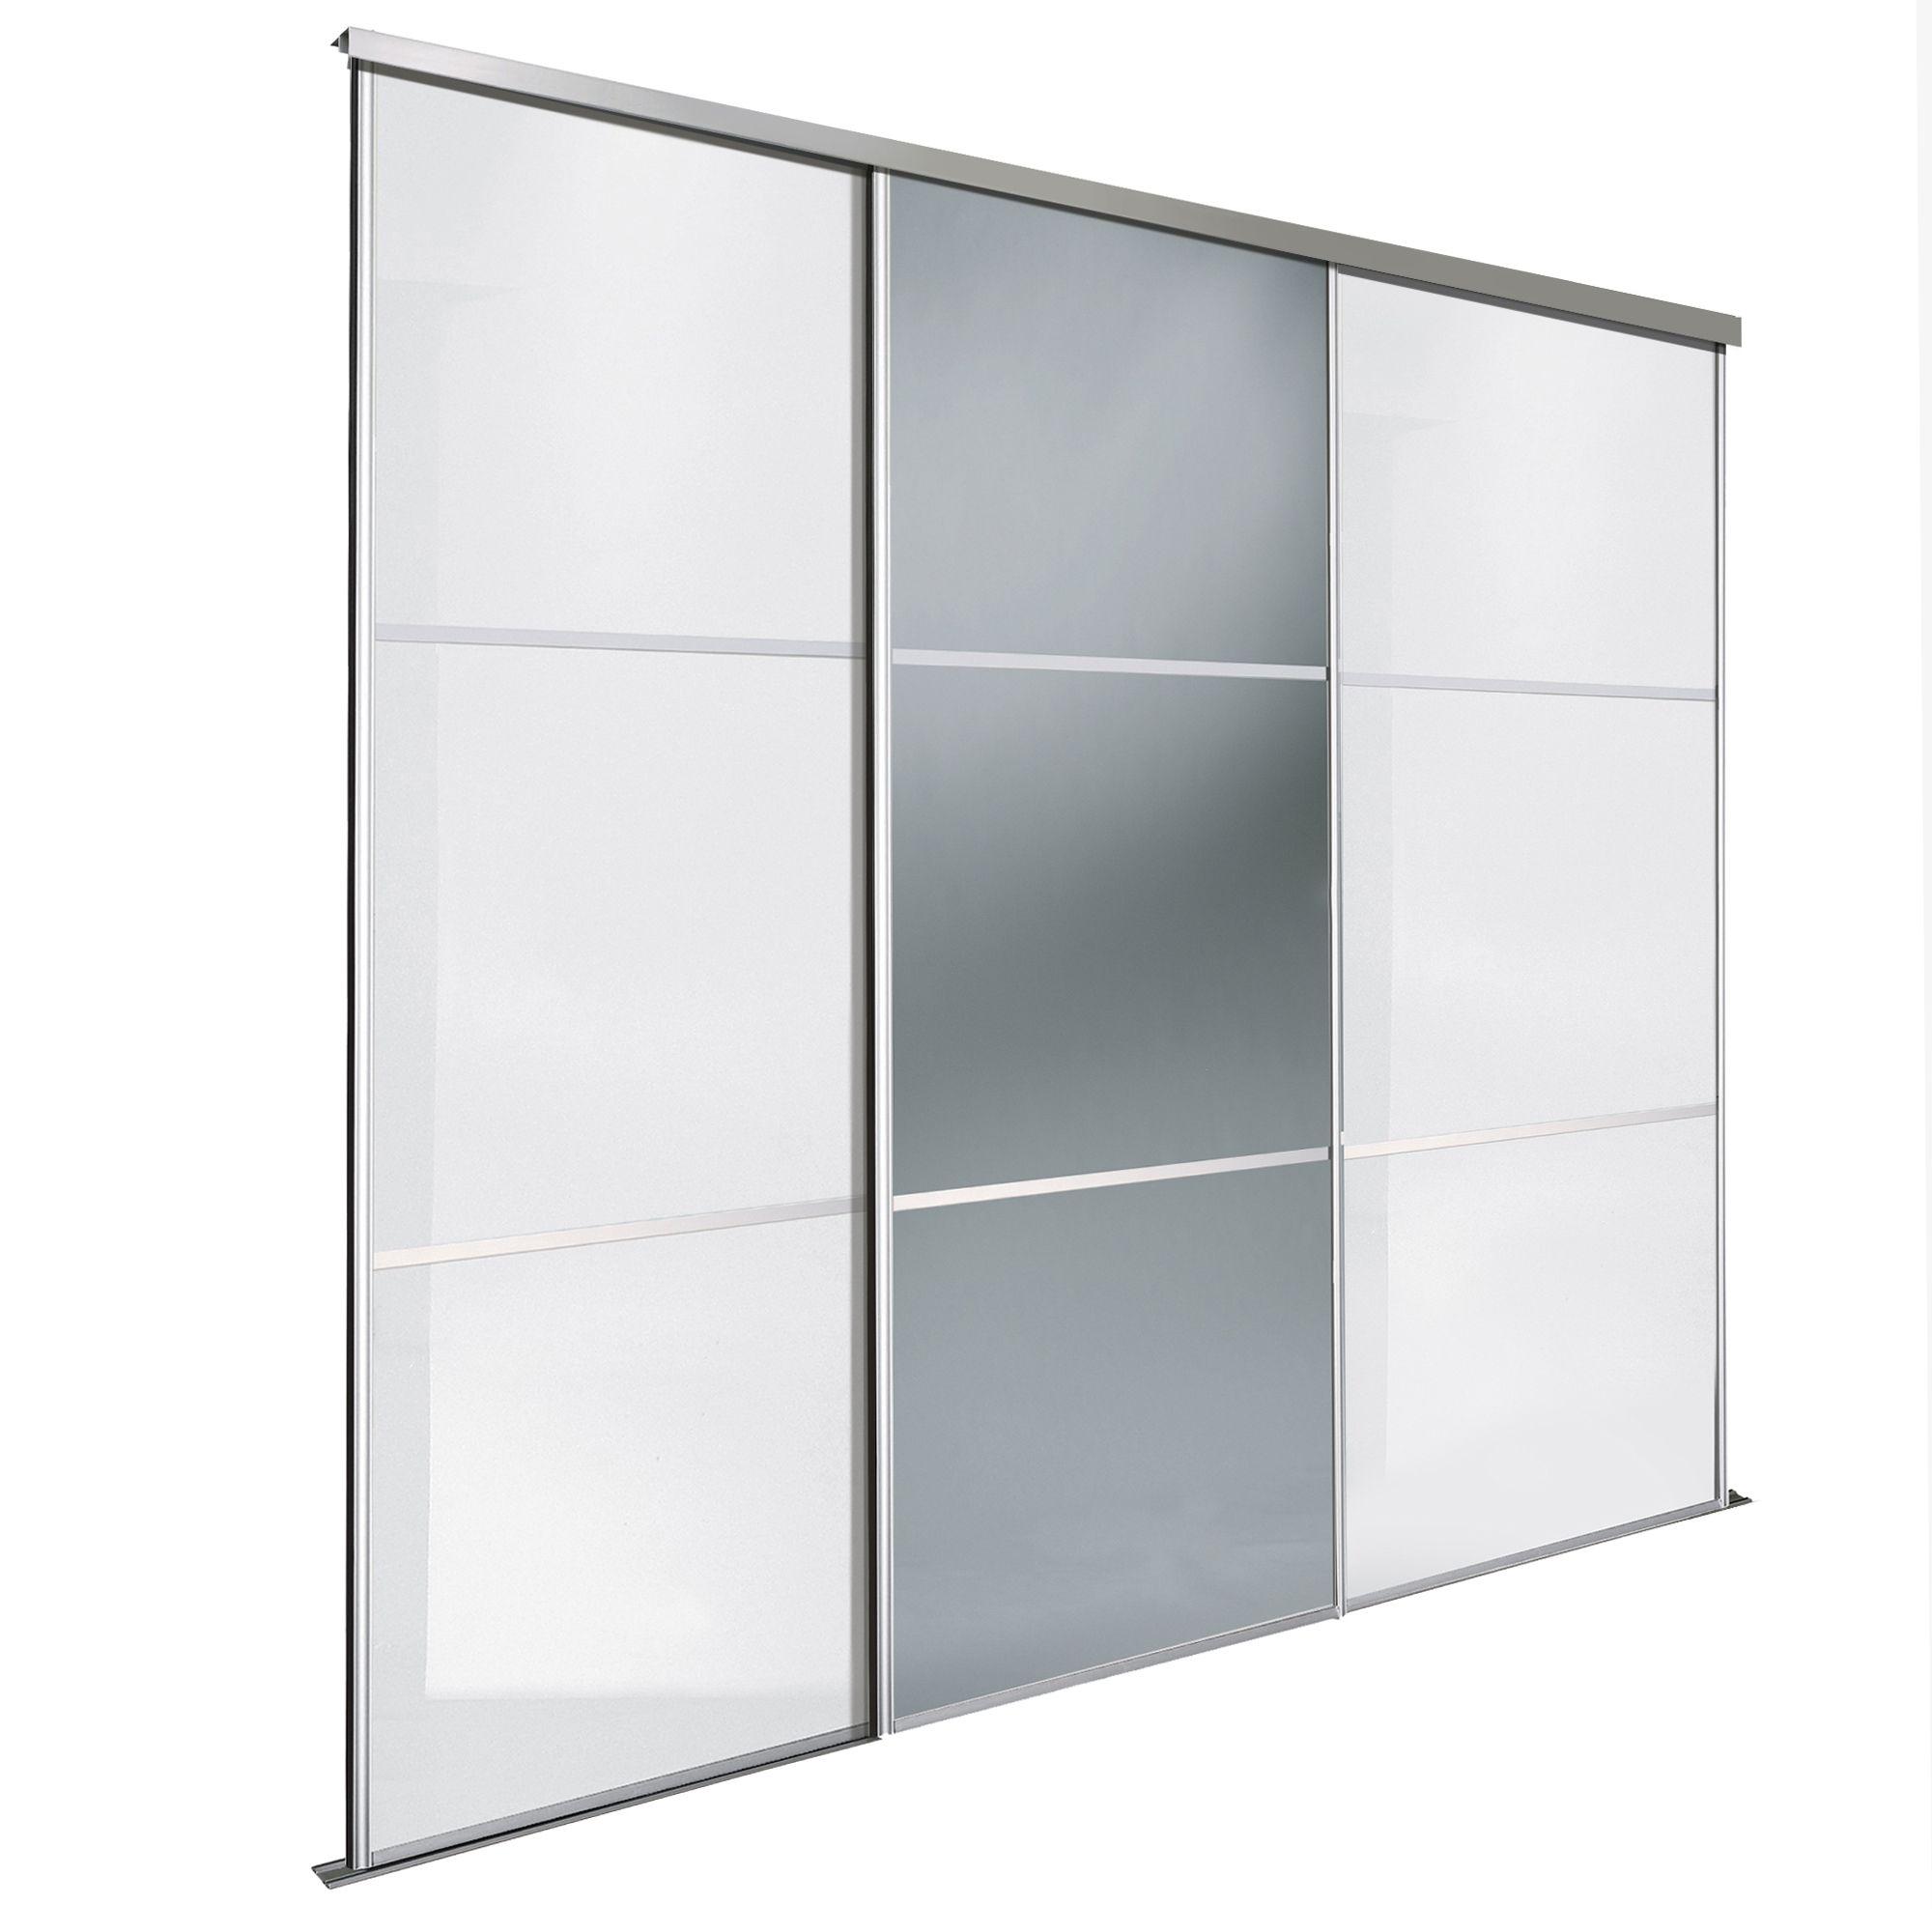 Premium Select White & Smoked Grey Mirror Sliding Wardrobe Door Kit (h)2220 Mm (w)914 Mm, Pack Of 3